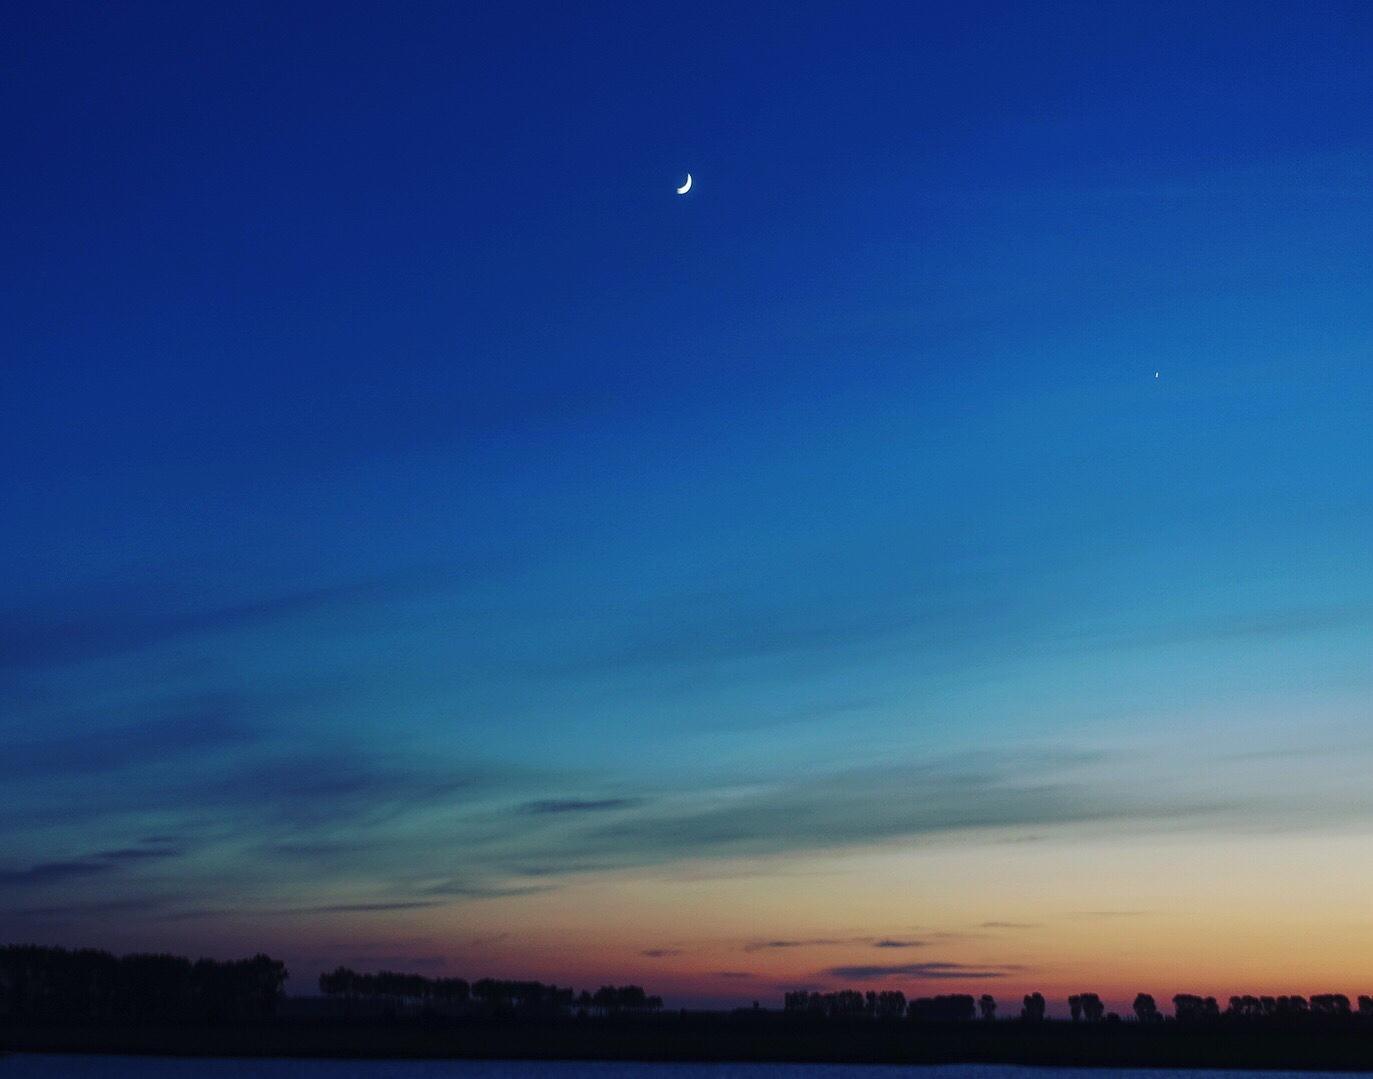 【明日12:46 天秤座の新月】